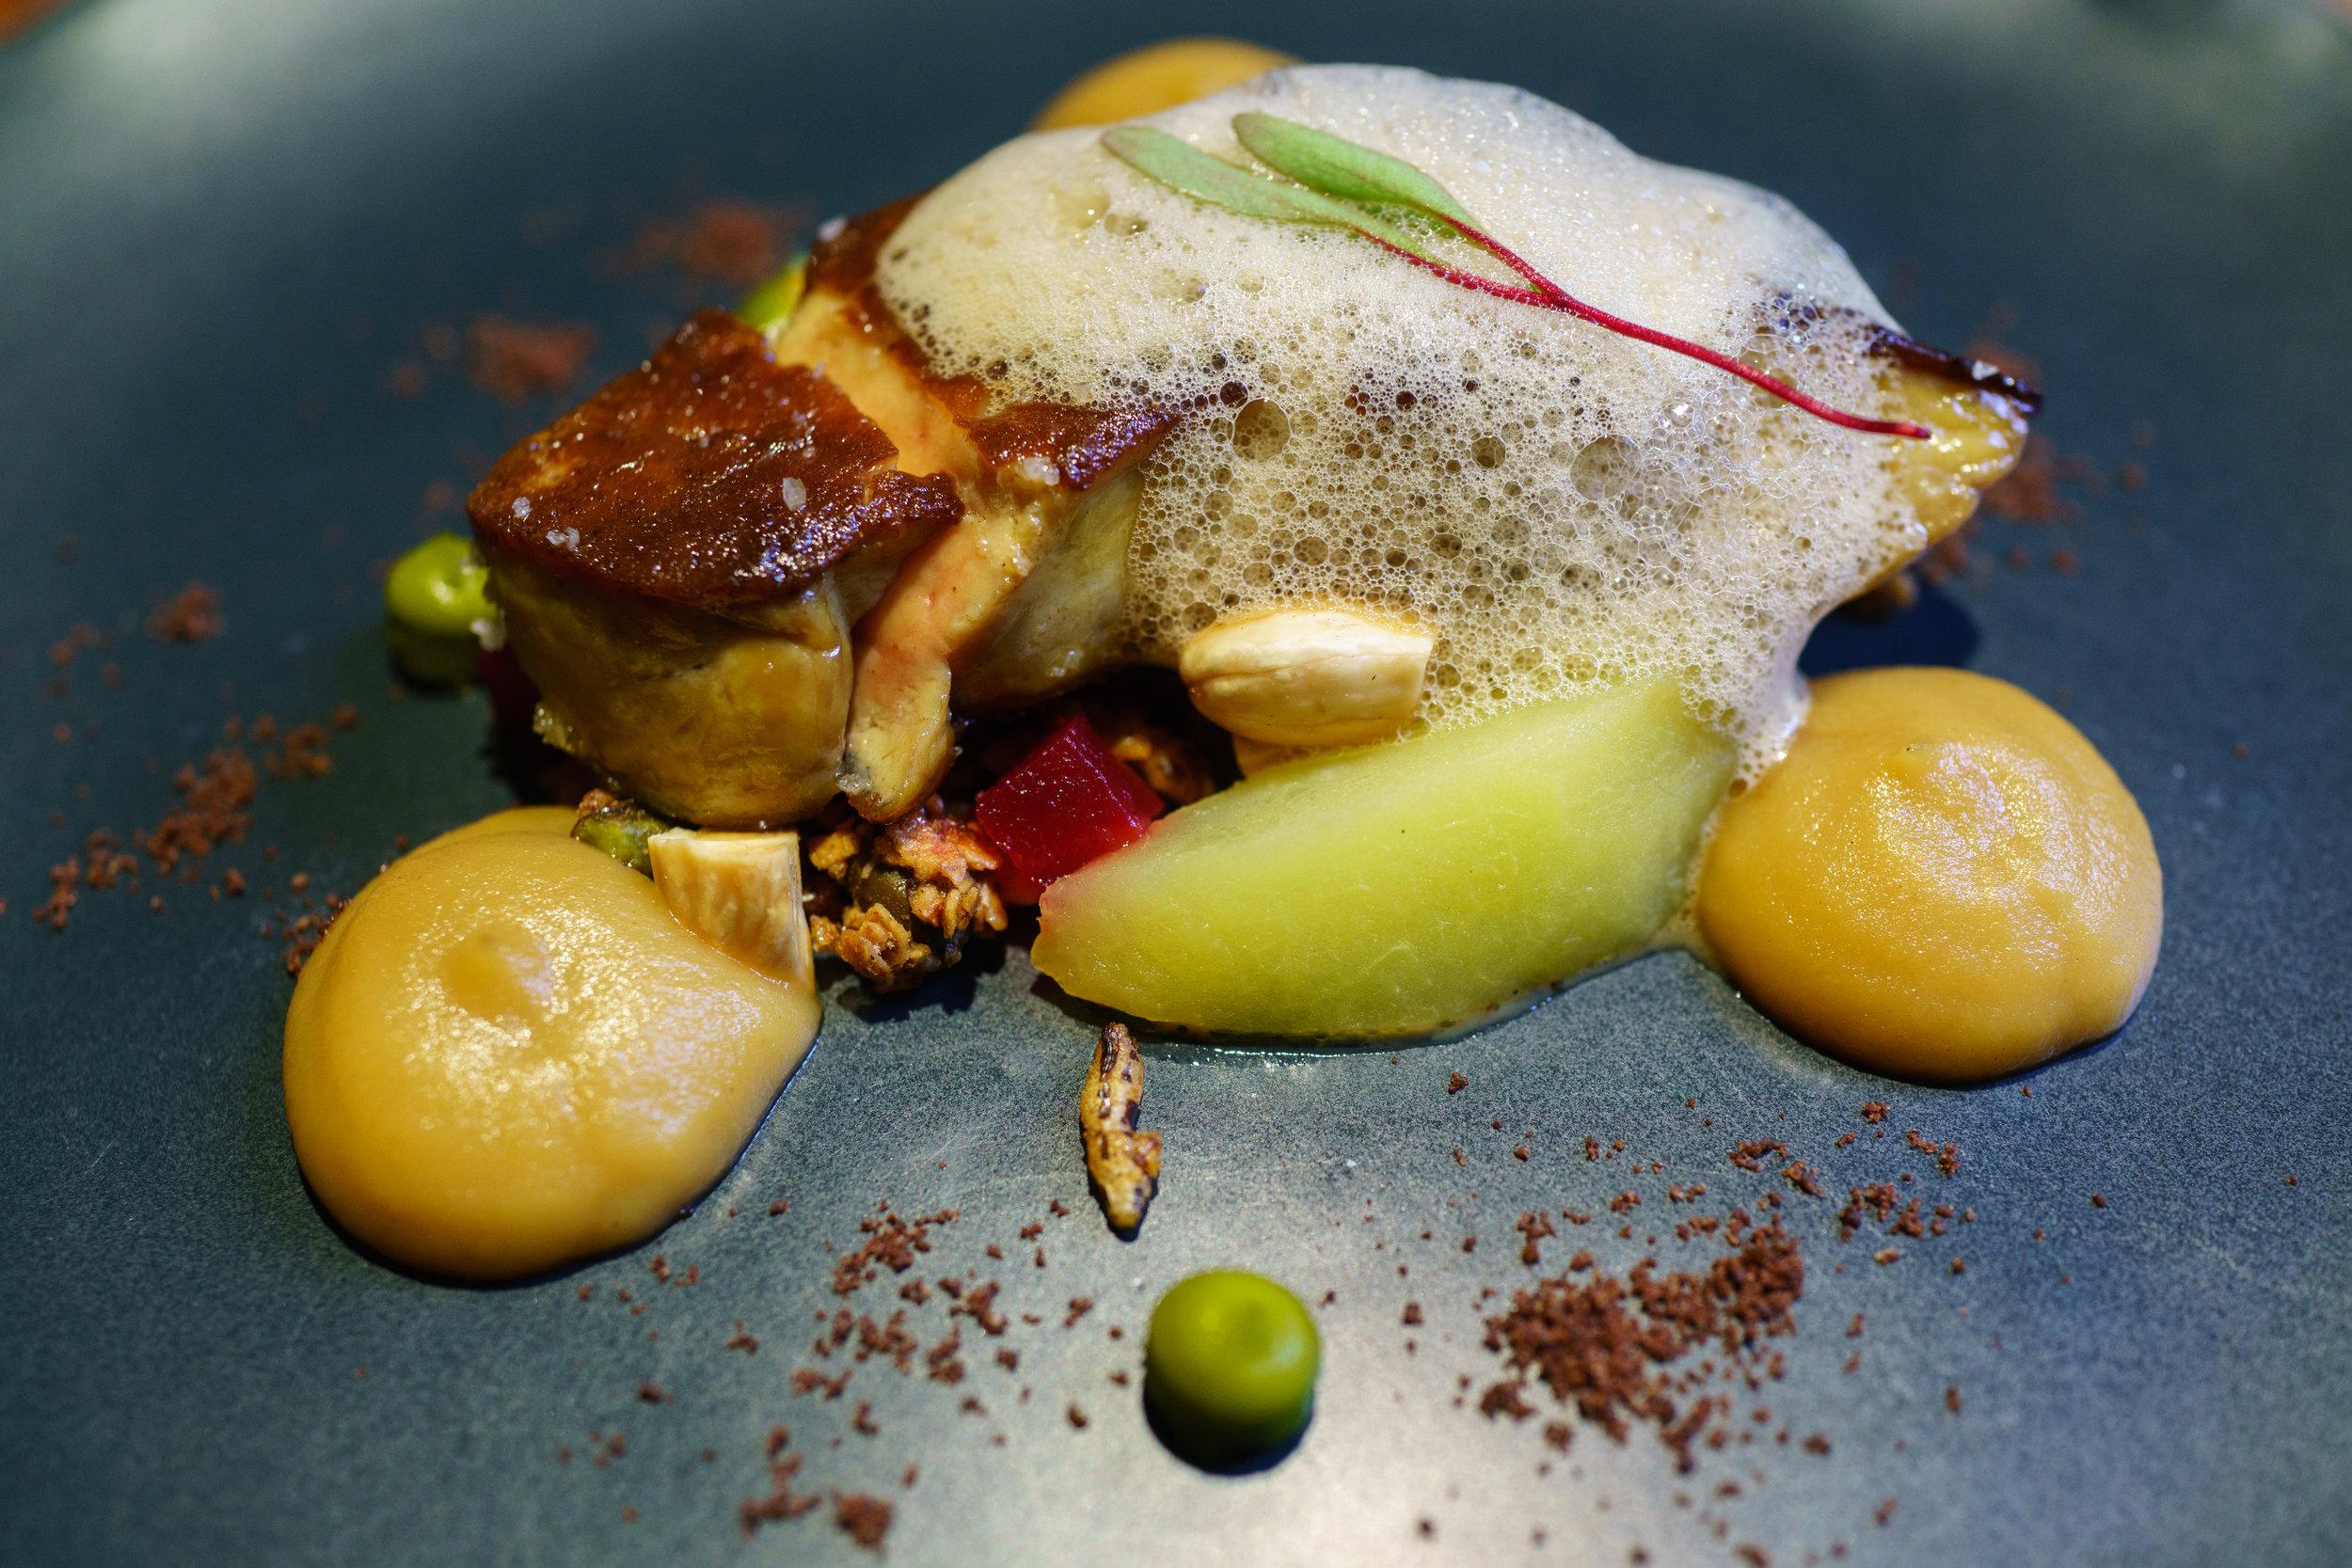 Seared foie gras, apple, granola, almond, coffee